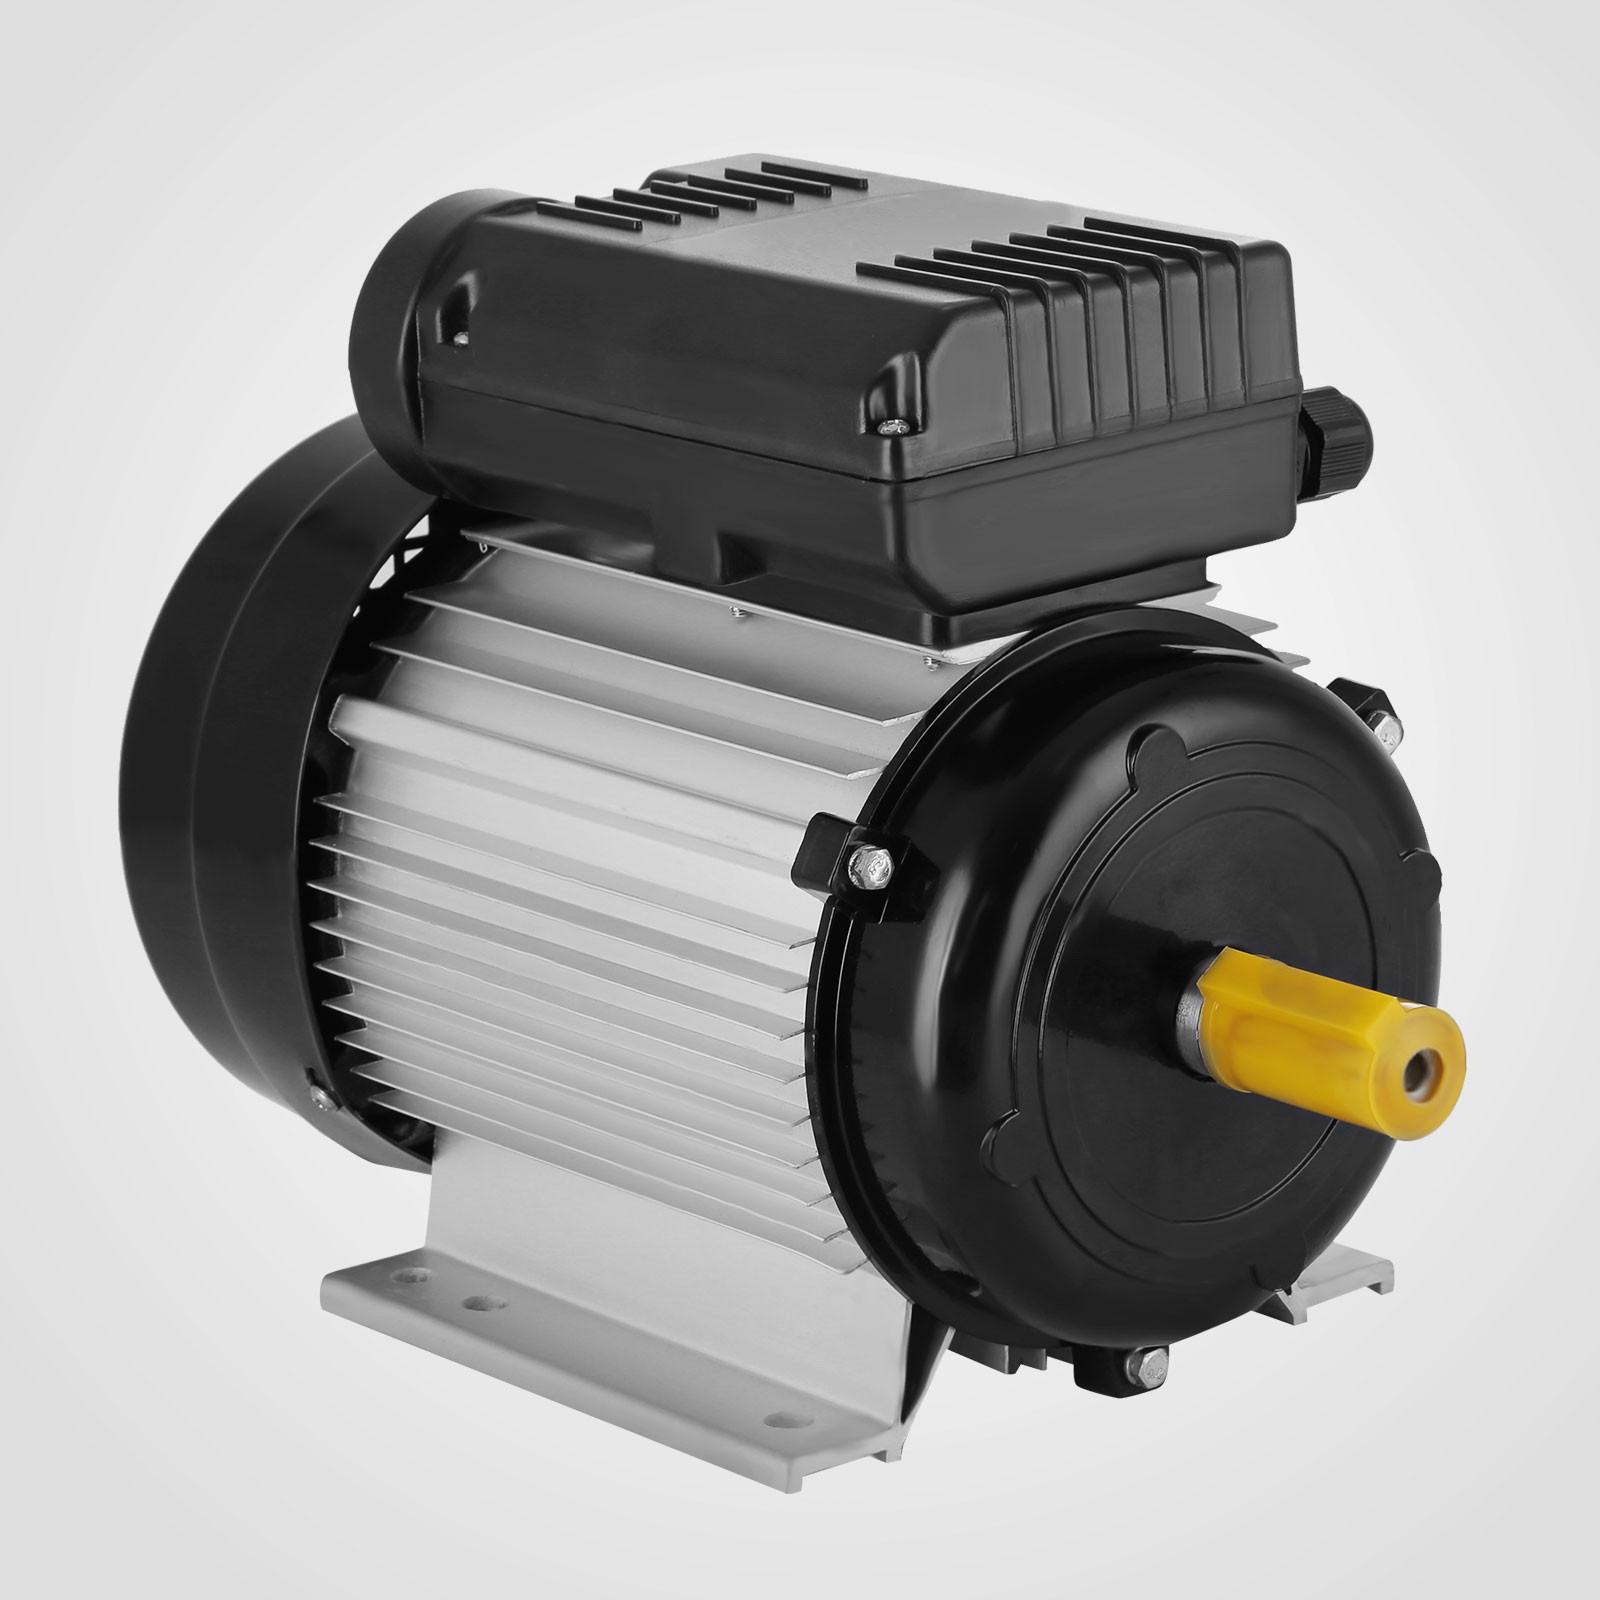 elektromotor 230 v 2 pol motor f r kompressor schweranlauf wechselstrom e motor. Black Bedroom Furniture Sets. Home Design Ideas